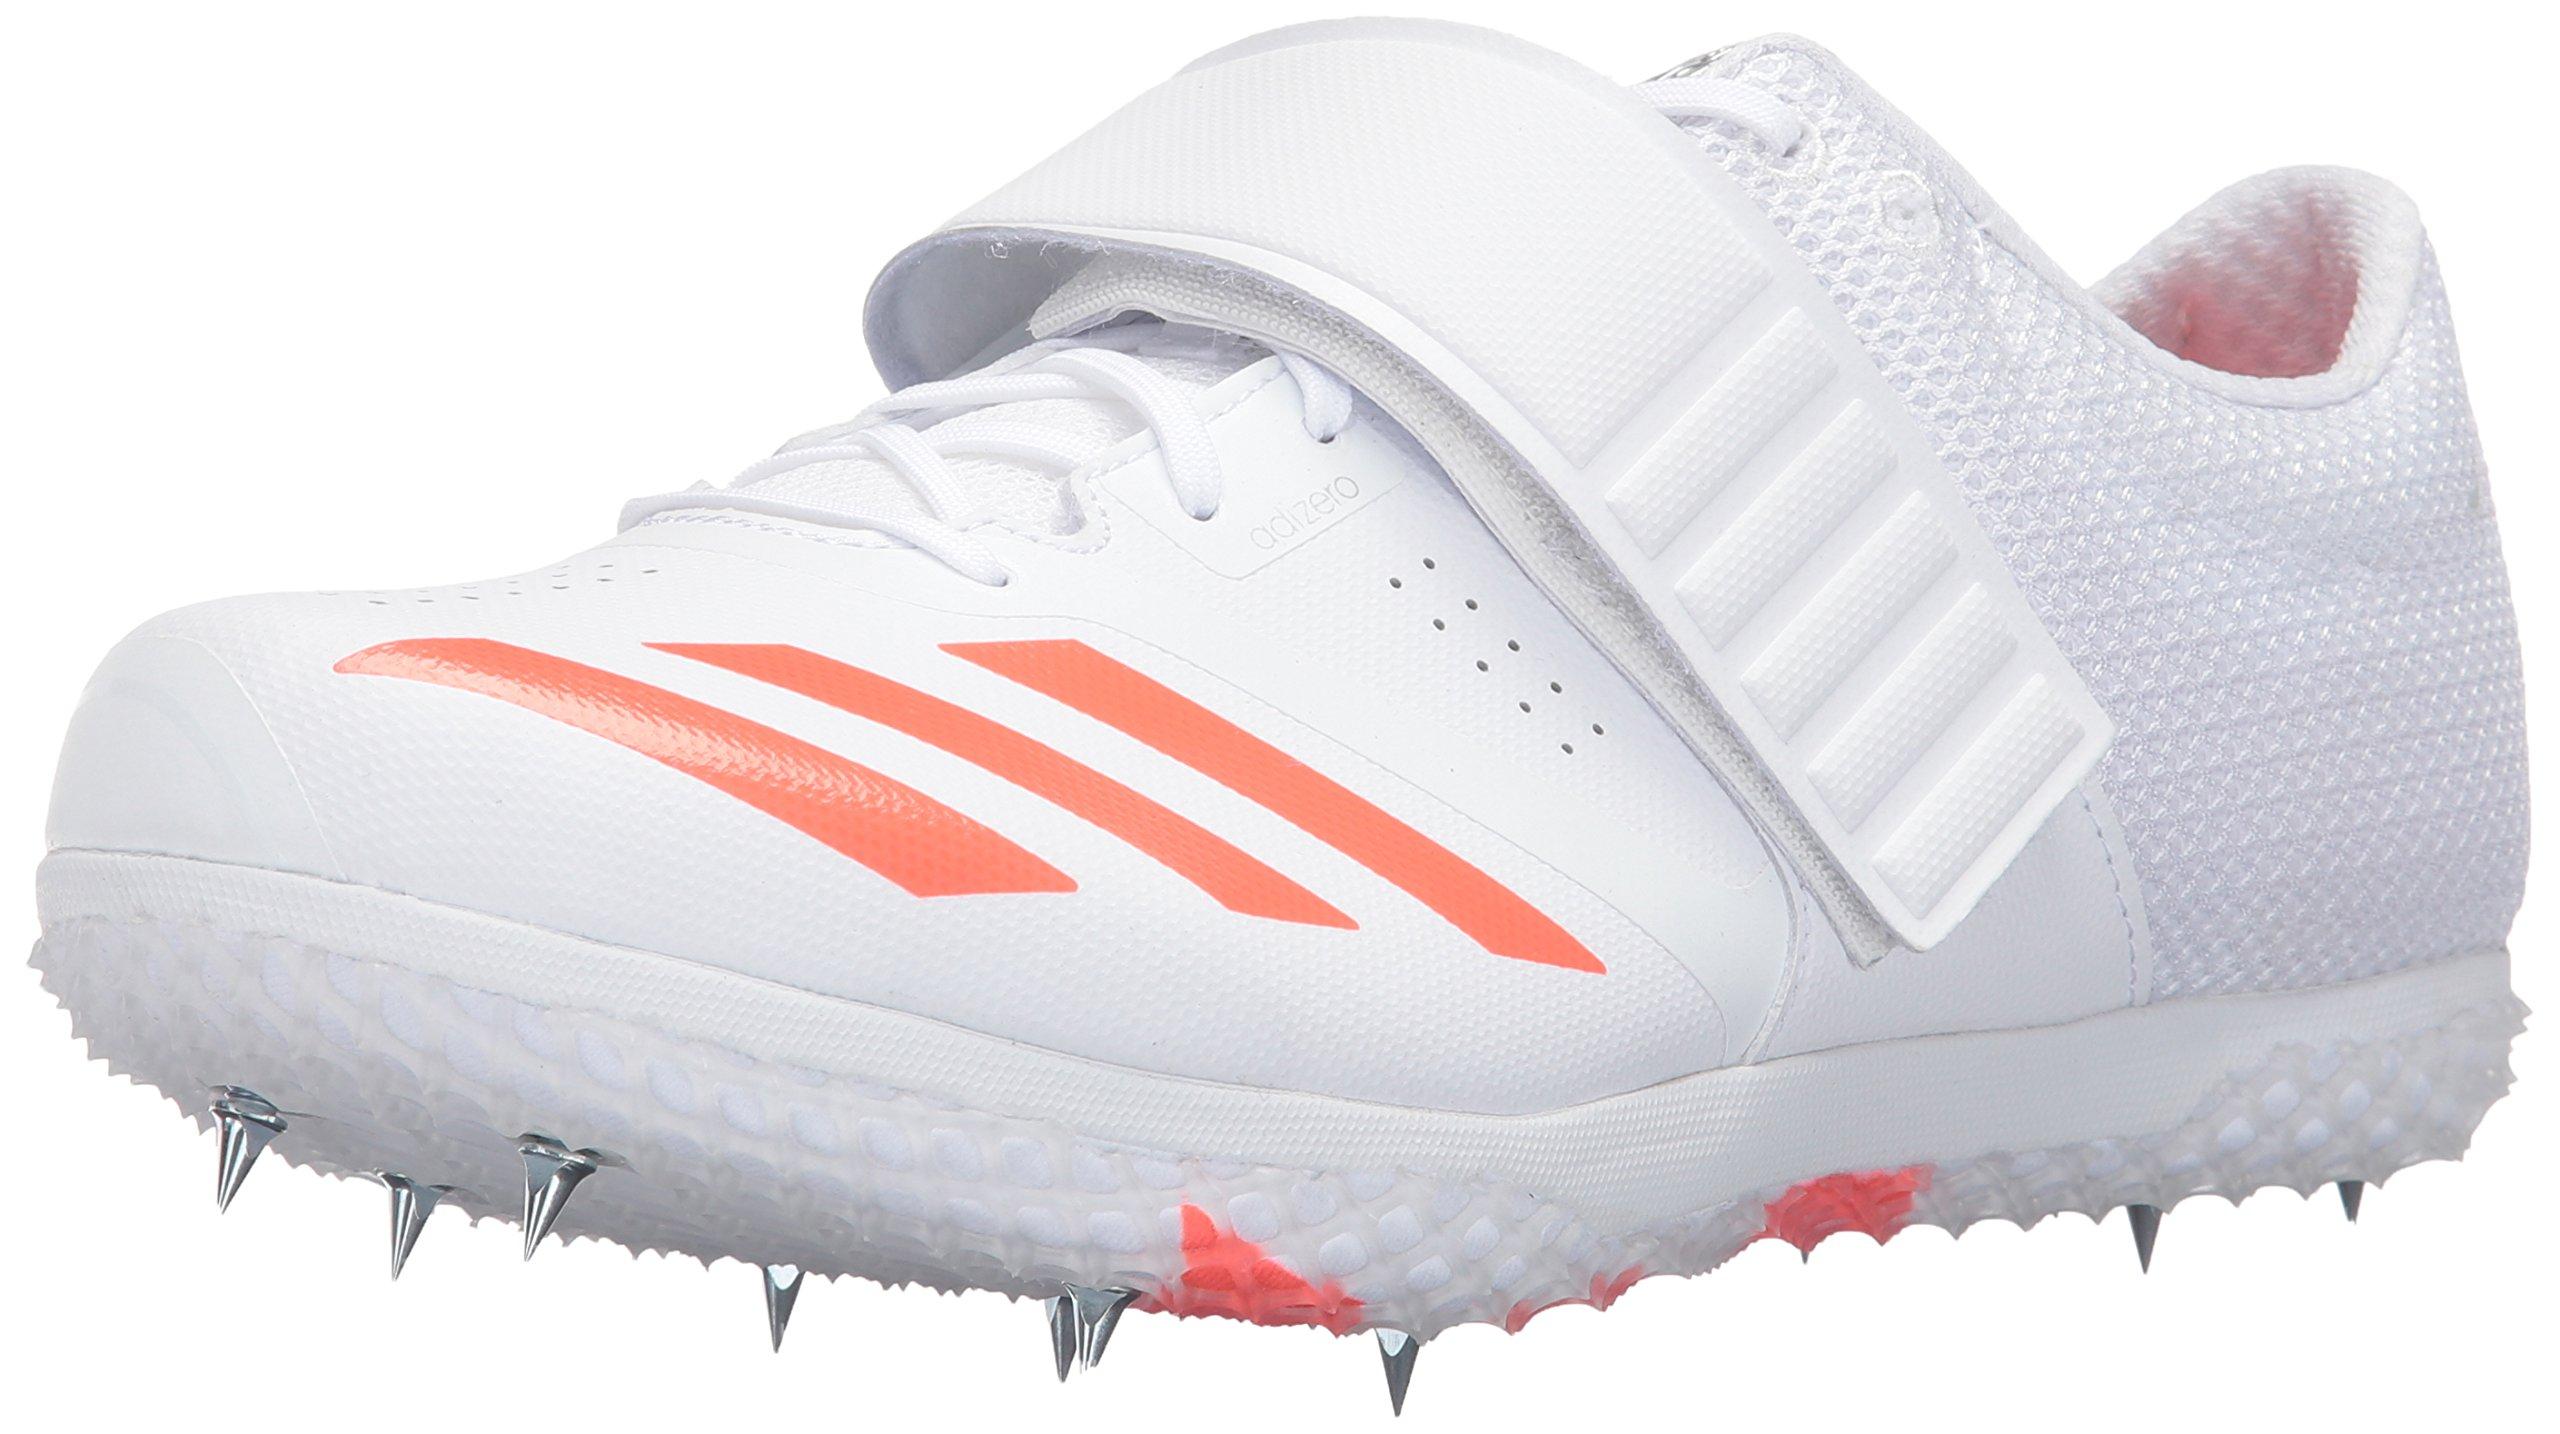 adidas Adizero HJ Track Shoe, White/Infrared/Metallic Silver, 9 M US